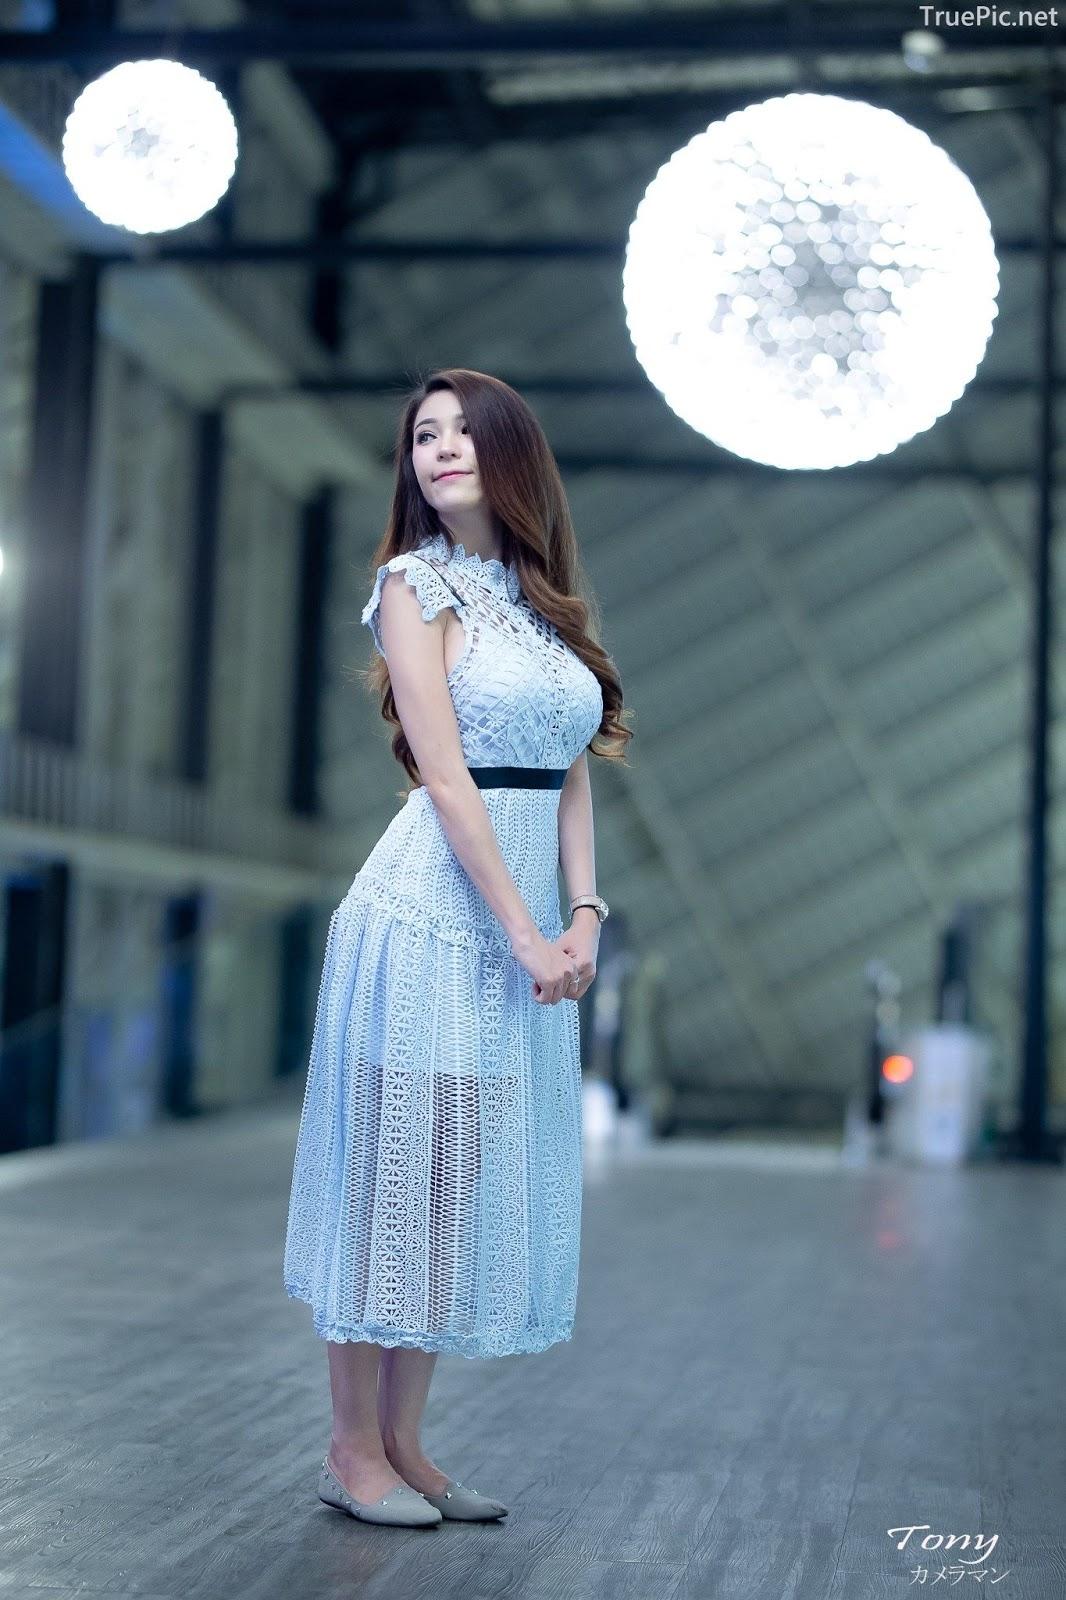 Thailand hot model – Janet Kanokwan Saesim – Sexy vs Cute and Bra vs Long Dress - Picture 6